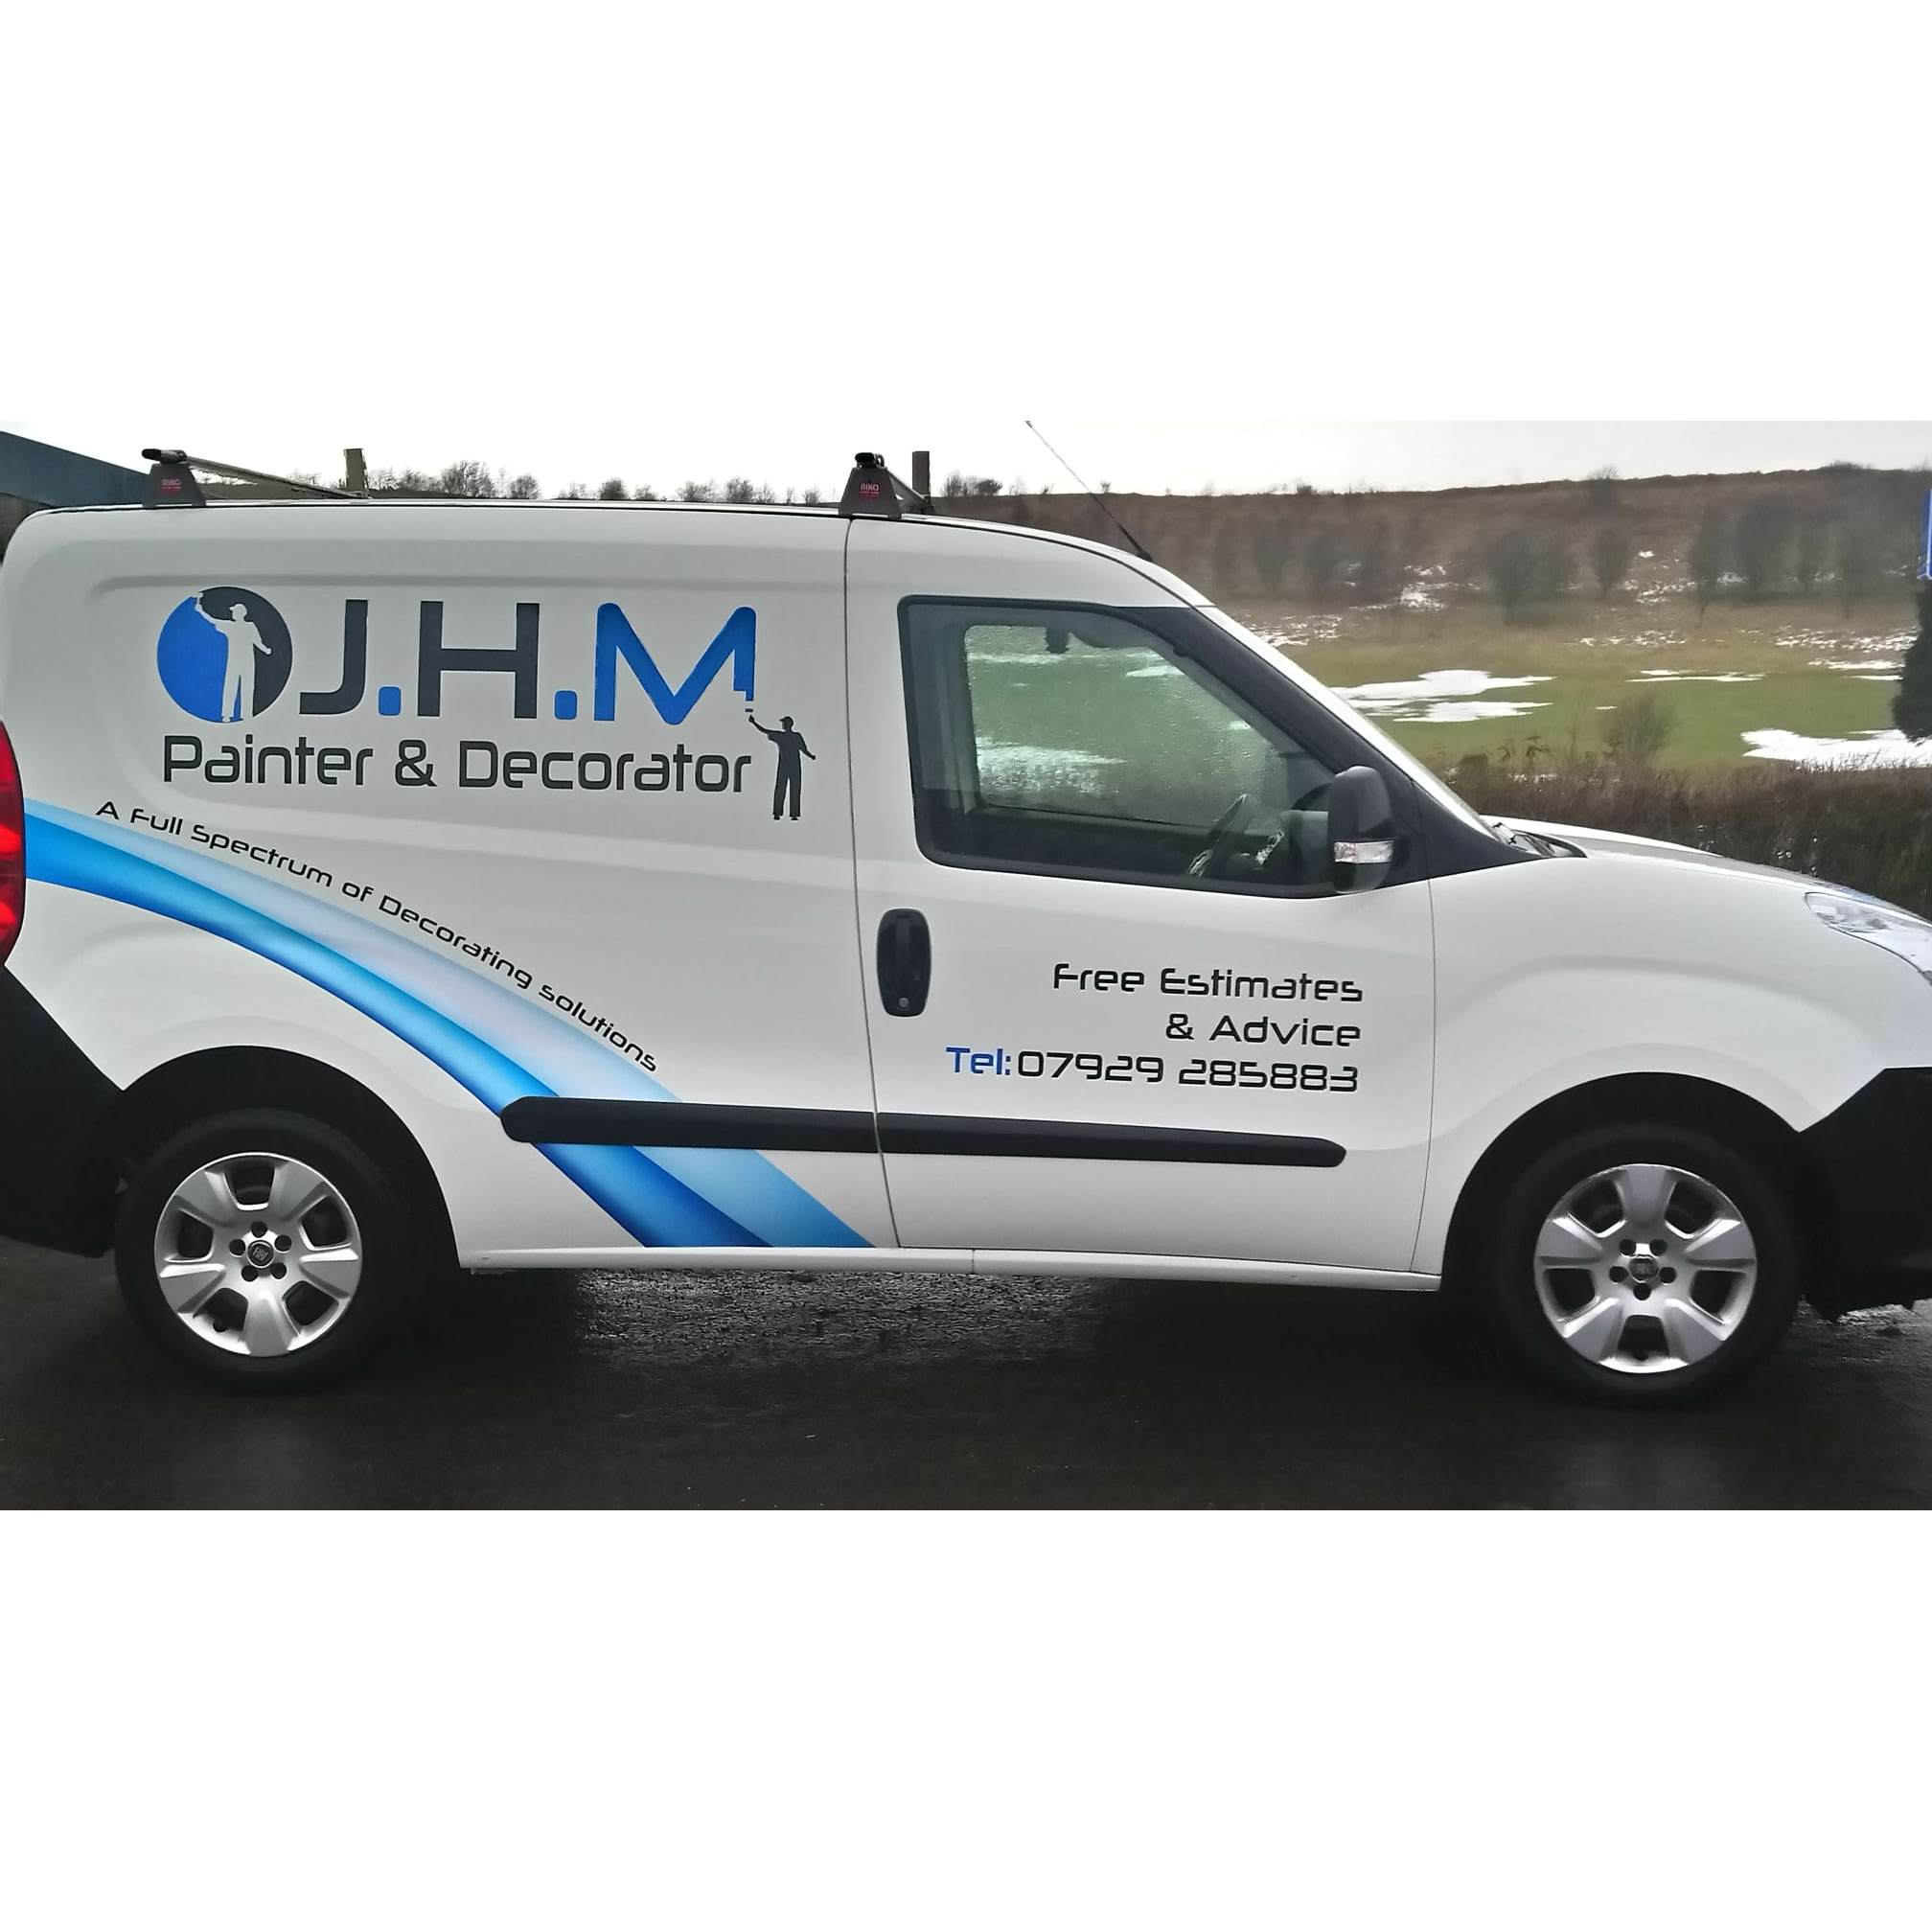 JHM Painter & Decorator - Glenrothes, Fife KY6 3DT - 07929 285883 | ShowMeLocal.com